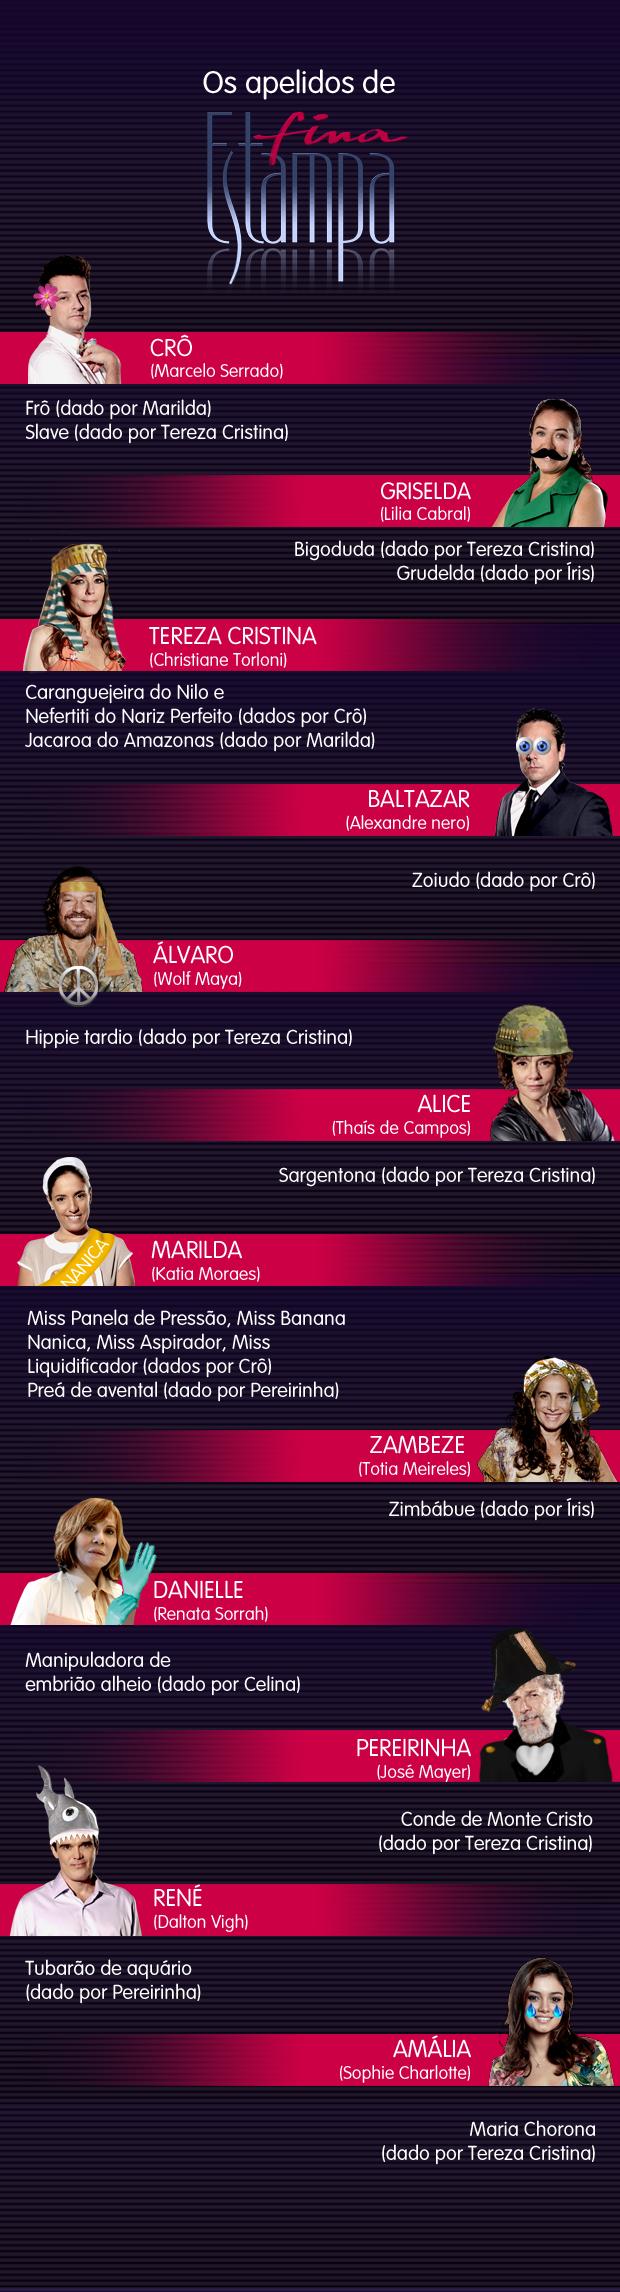 Apelidos de Fina Estampa (Foto: Fina Estampa/TV Globo)